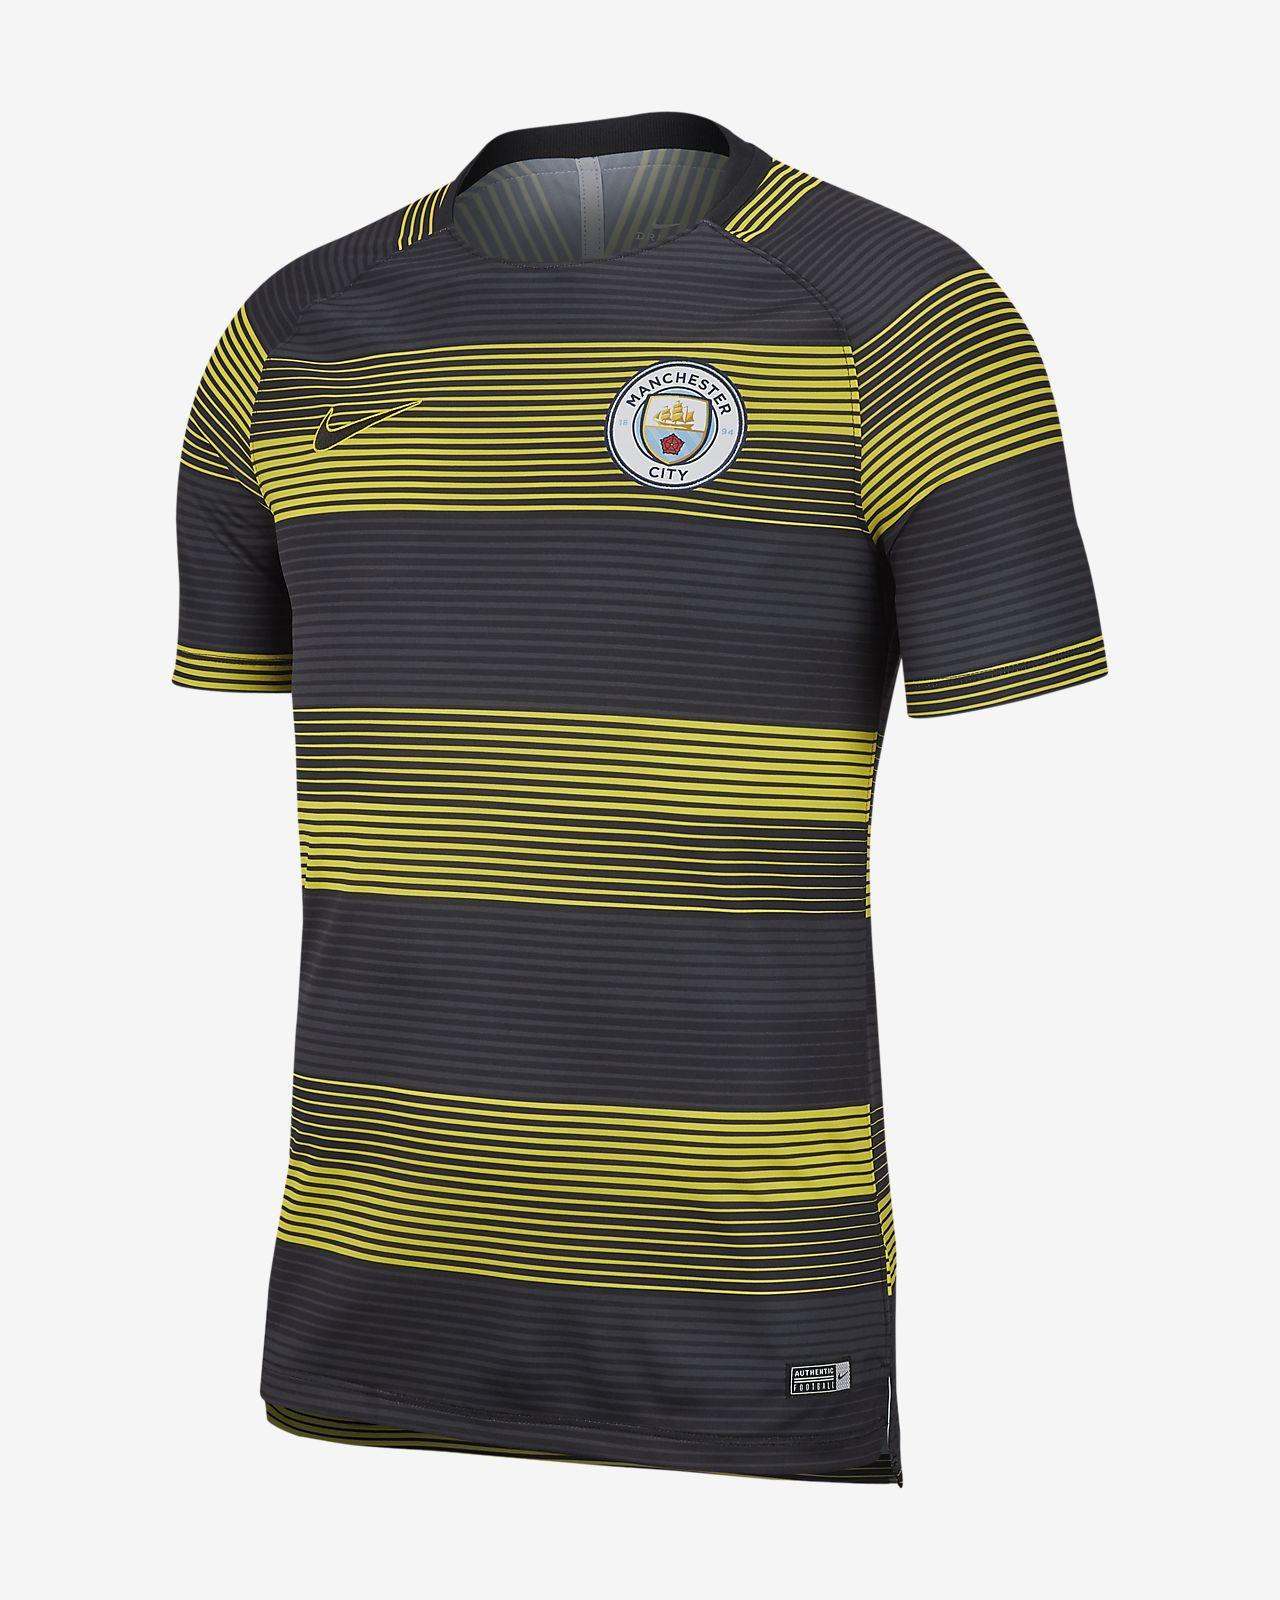 c258fbf2 Manchester City FC Dri-FIT Squad Men's Short-Sleeve Football Top ...